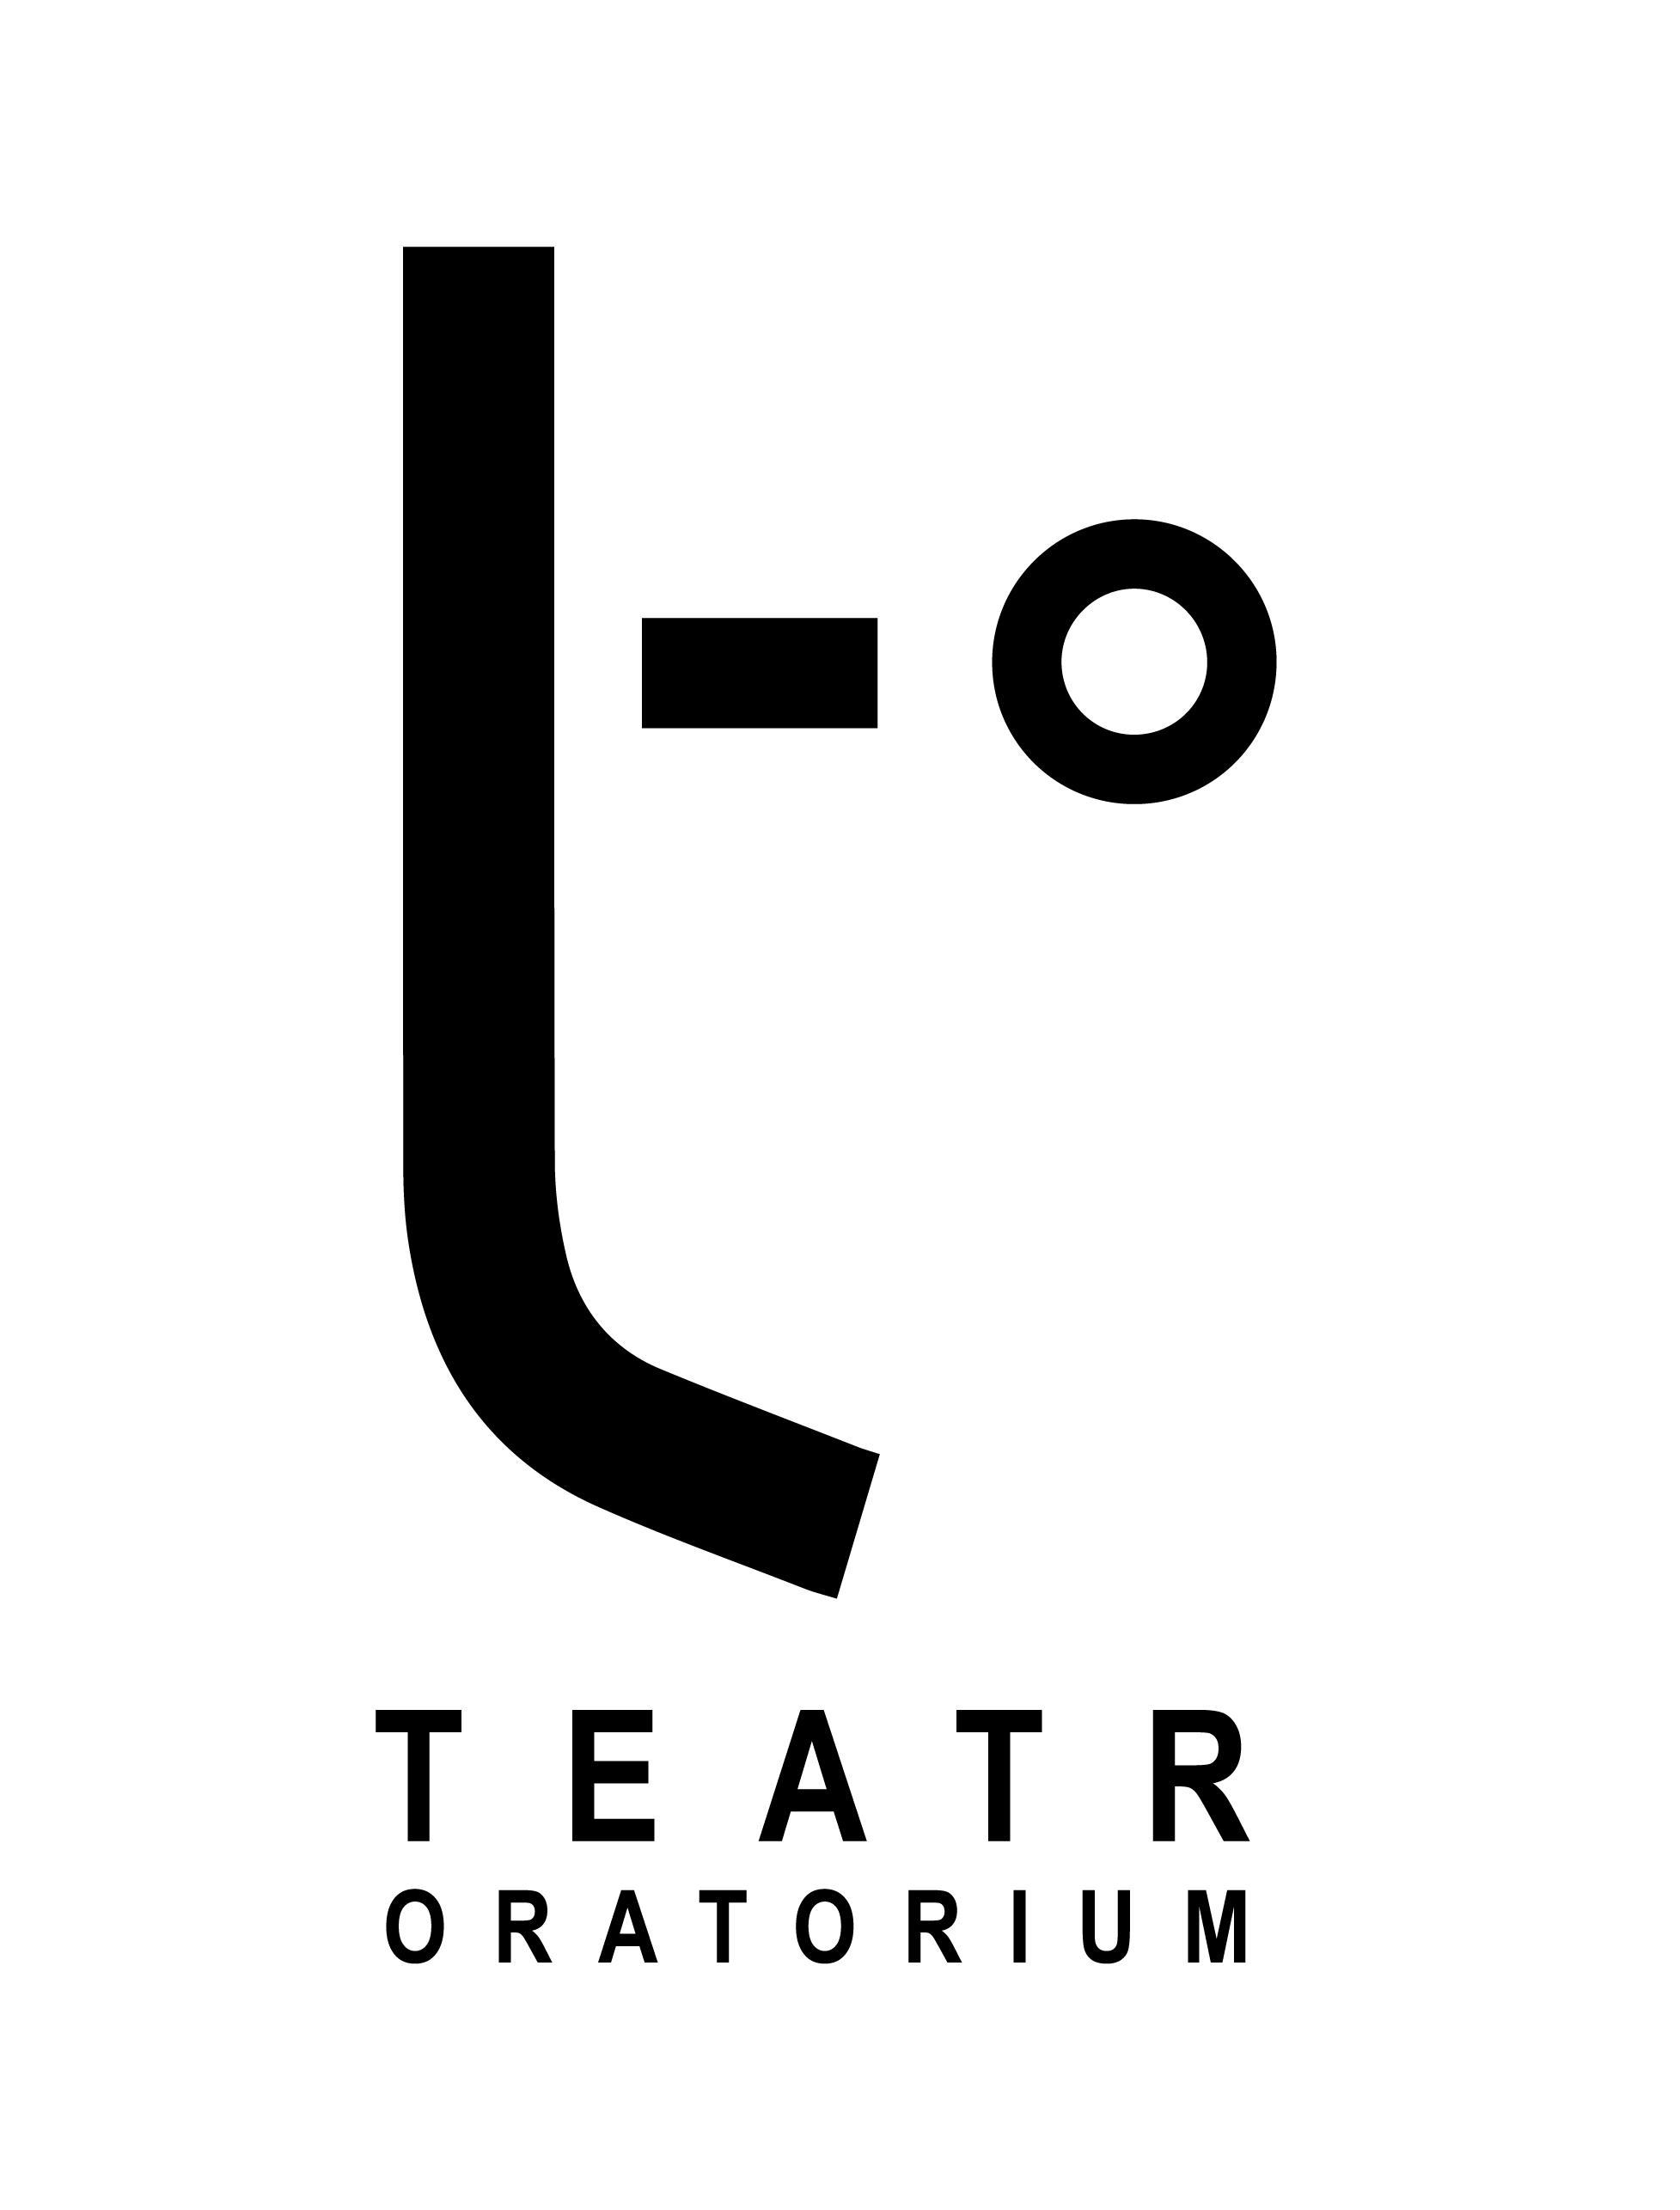 teatr logo